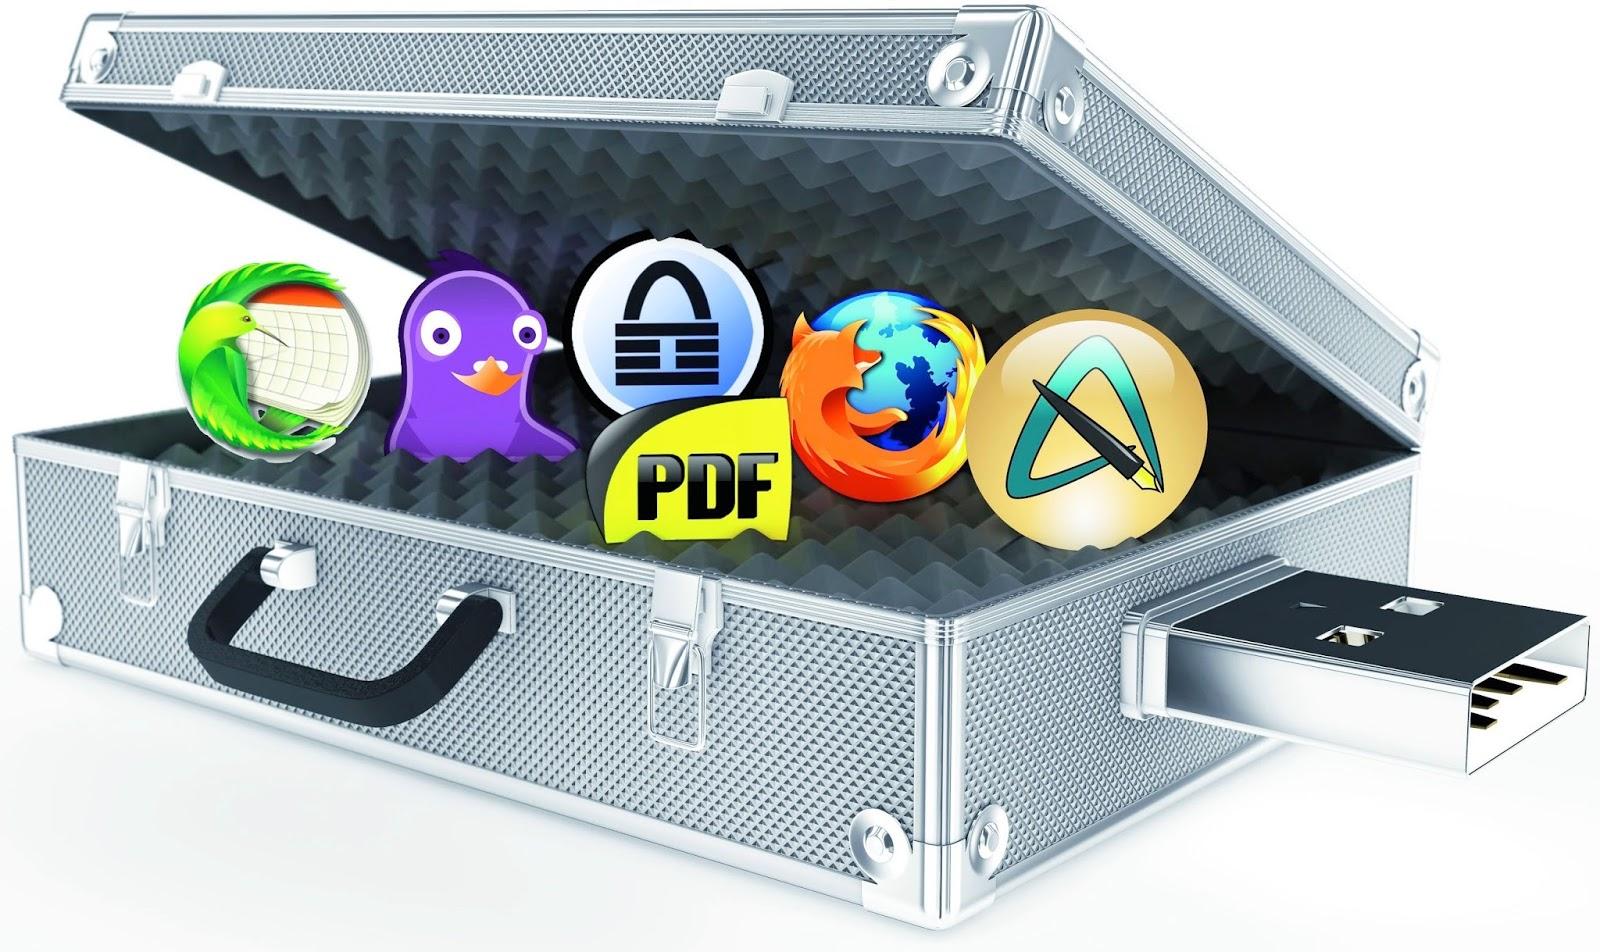 portable-software-creator-001.jpg